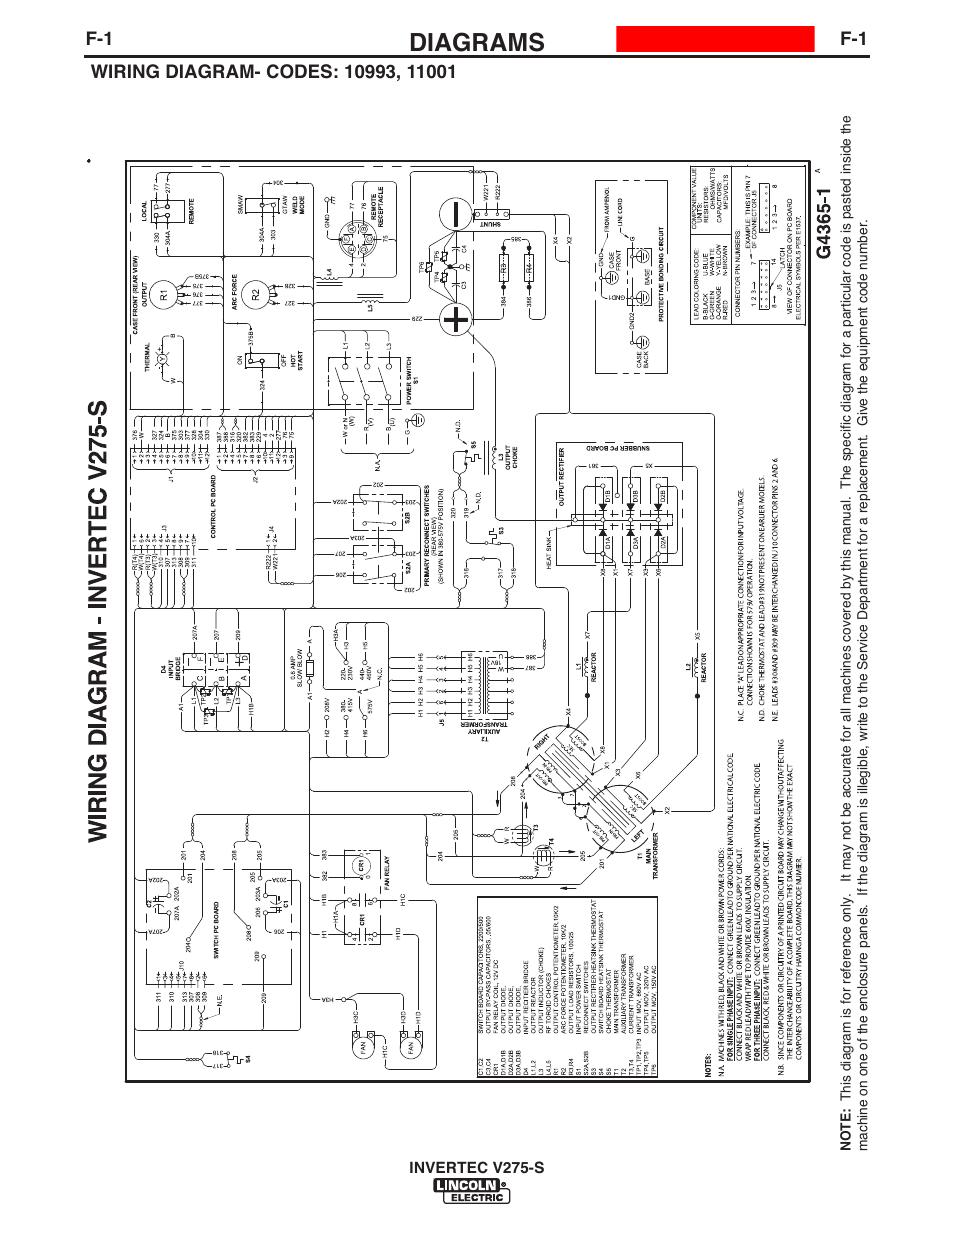 1996 lincoln continental fuse panel diagram